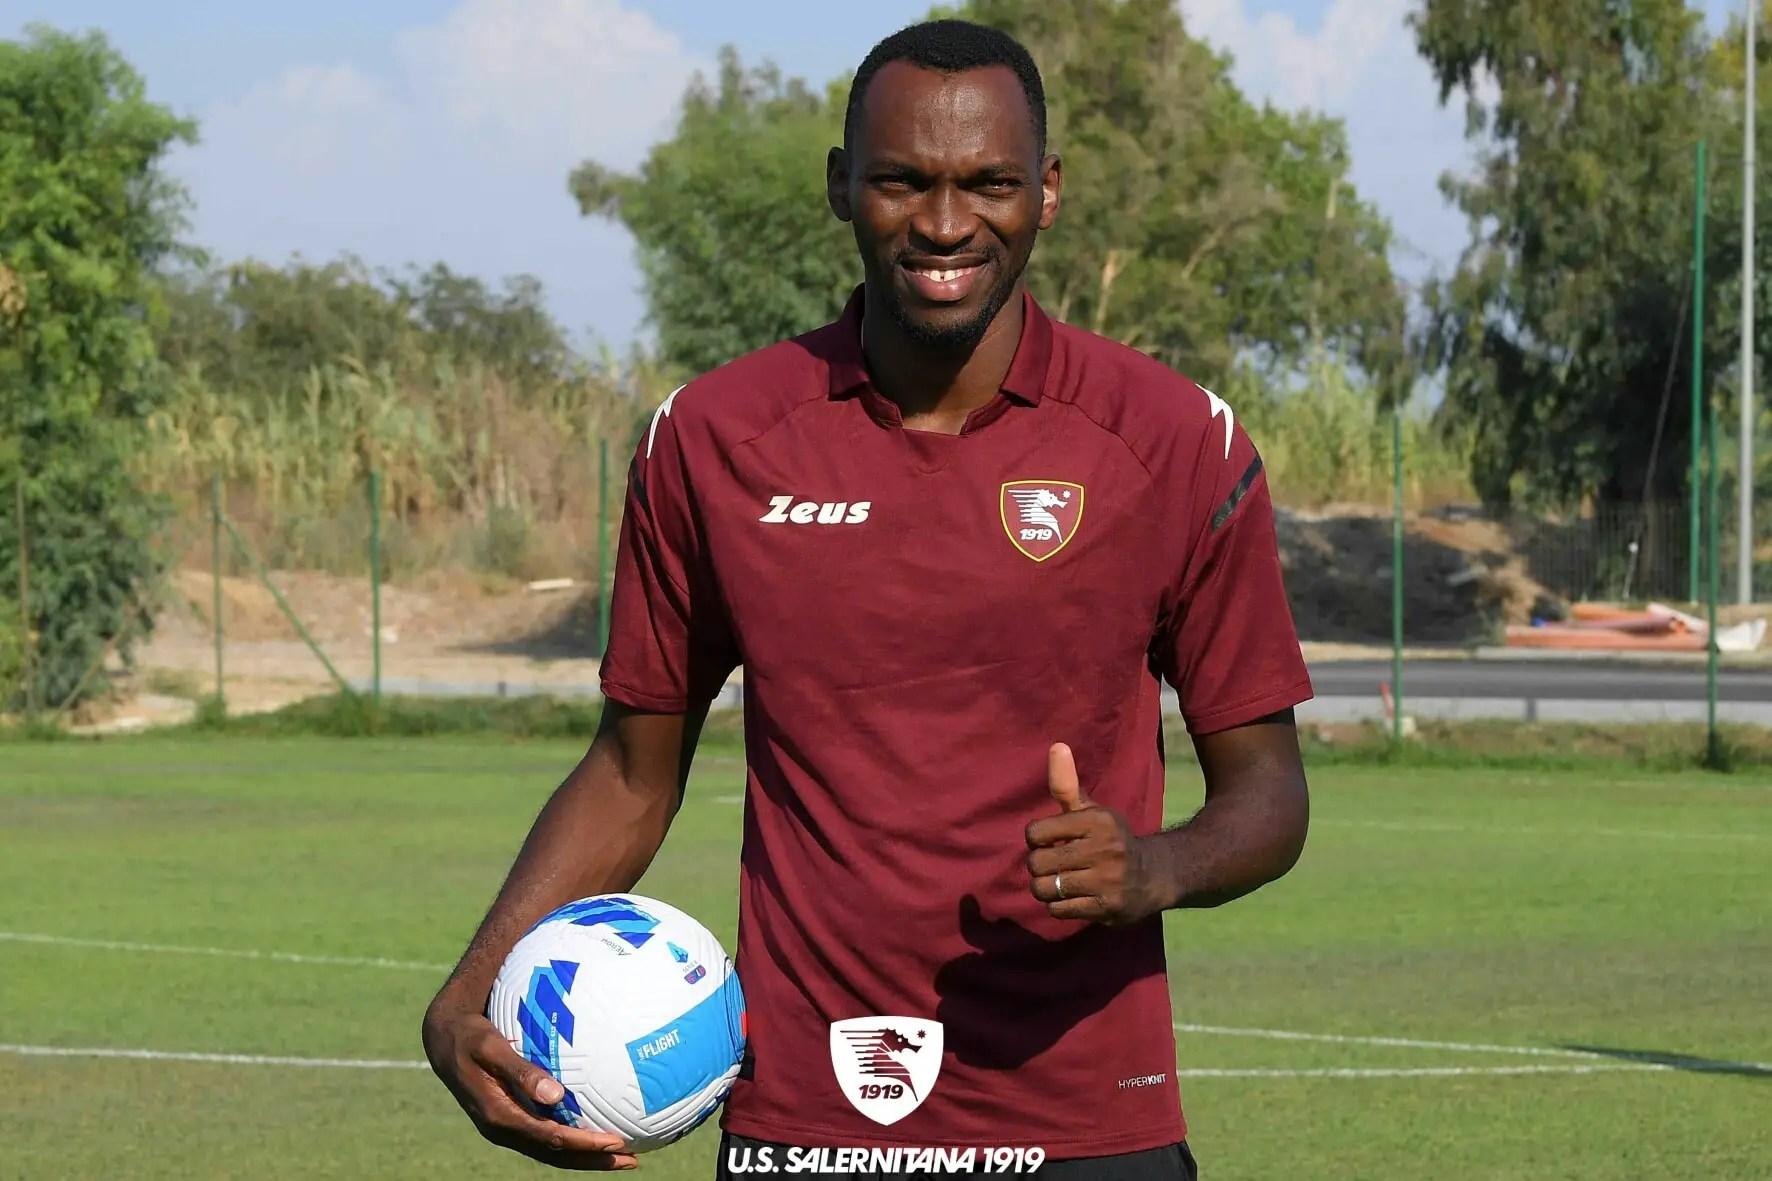 Simy Nwankwo Ready For New Challenge At Salernitana